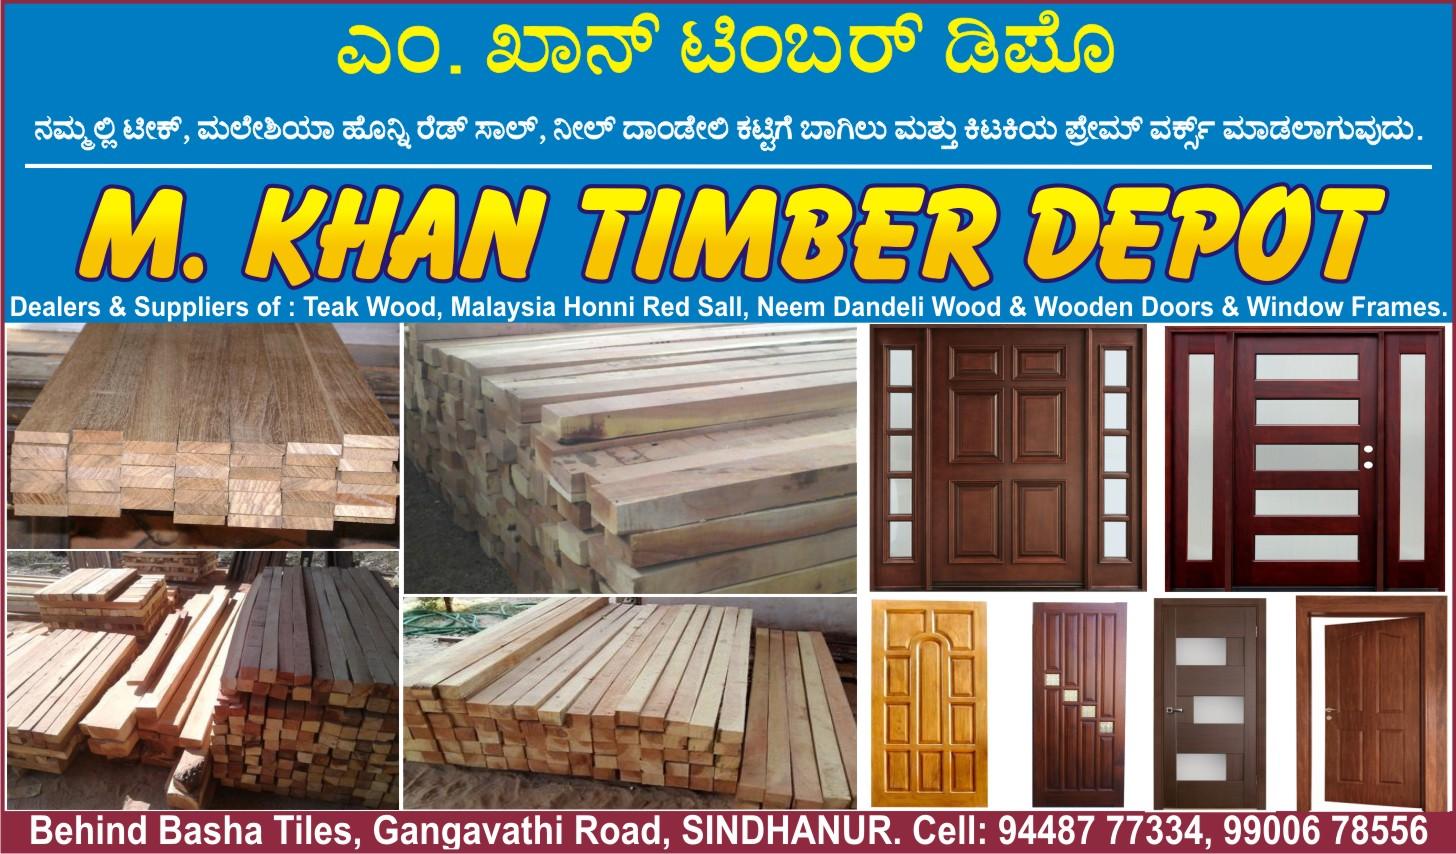 M. Khan Timber Depot